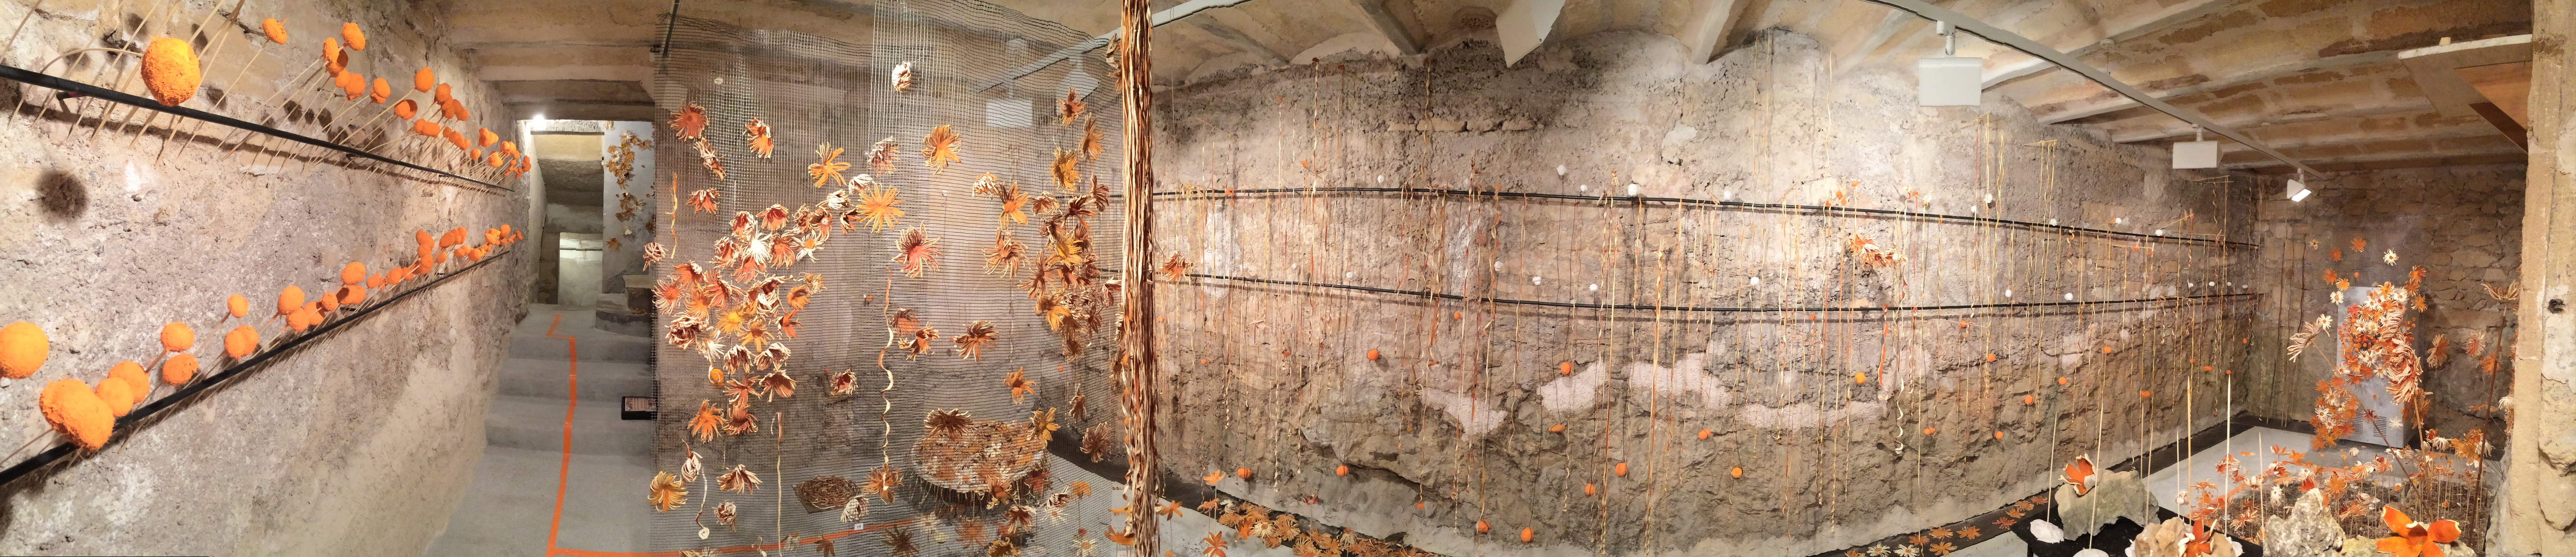 Installation Orange 1 - Capdepera